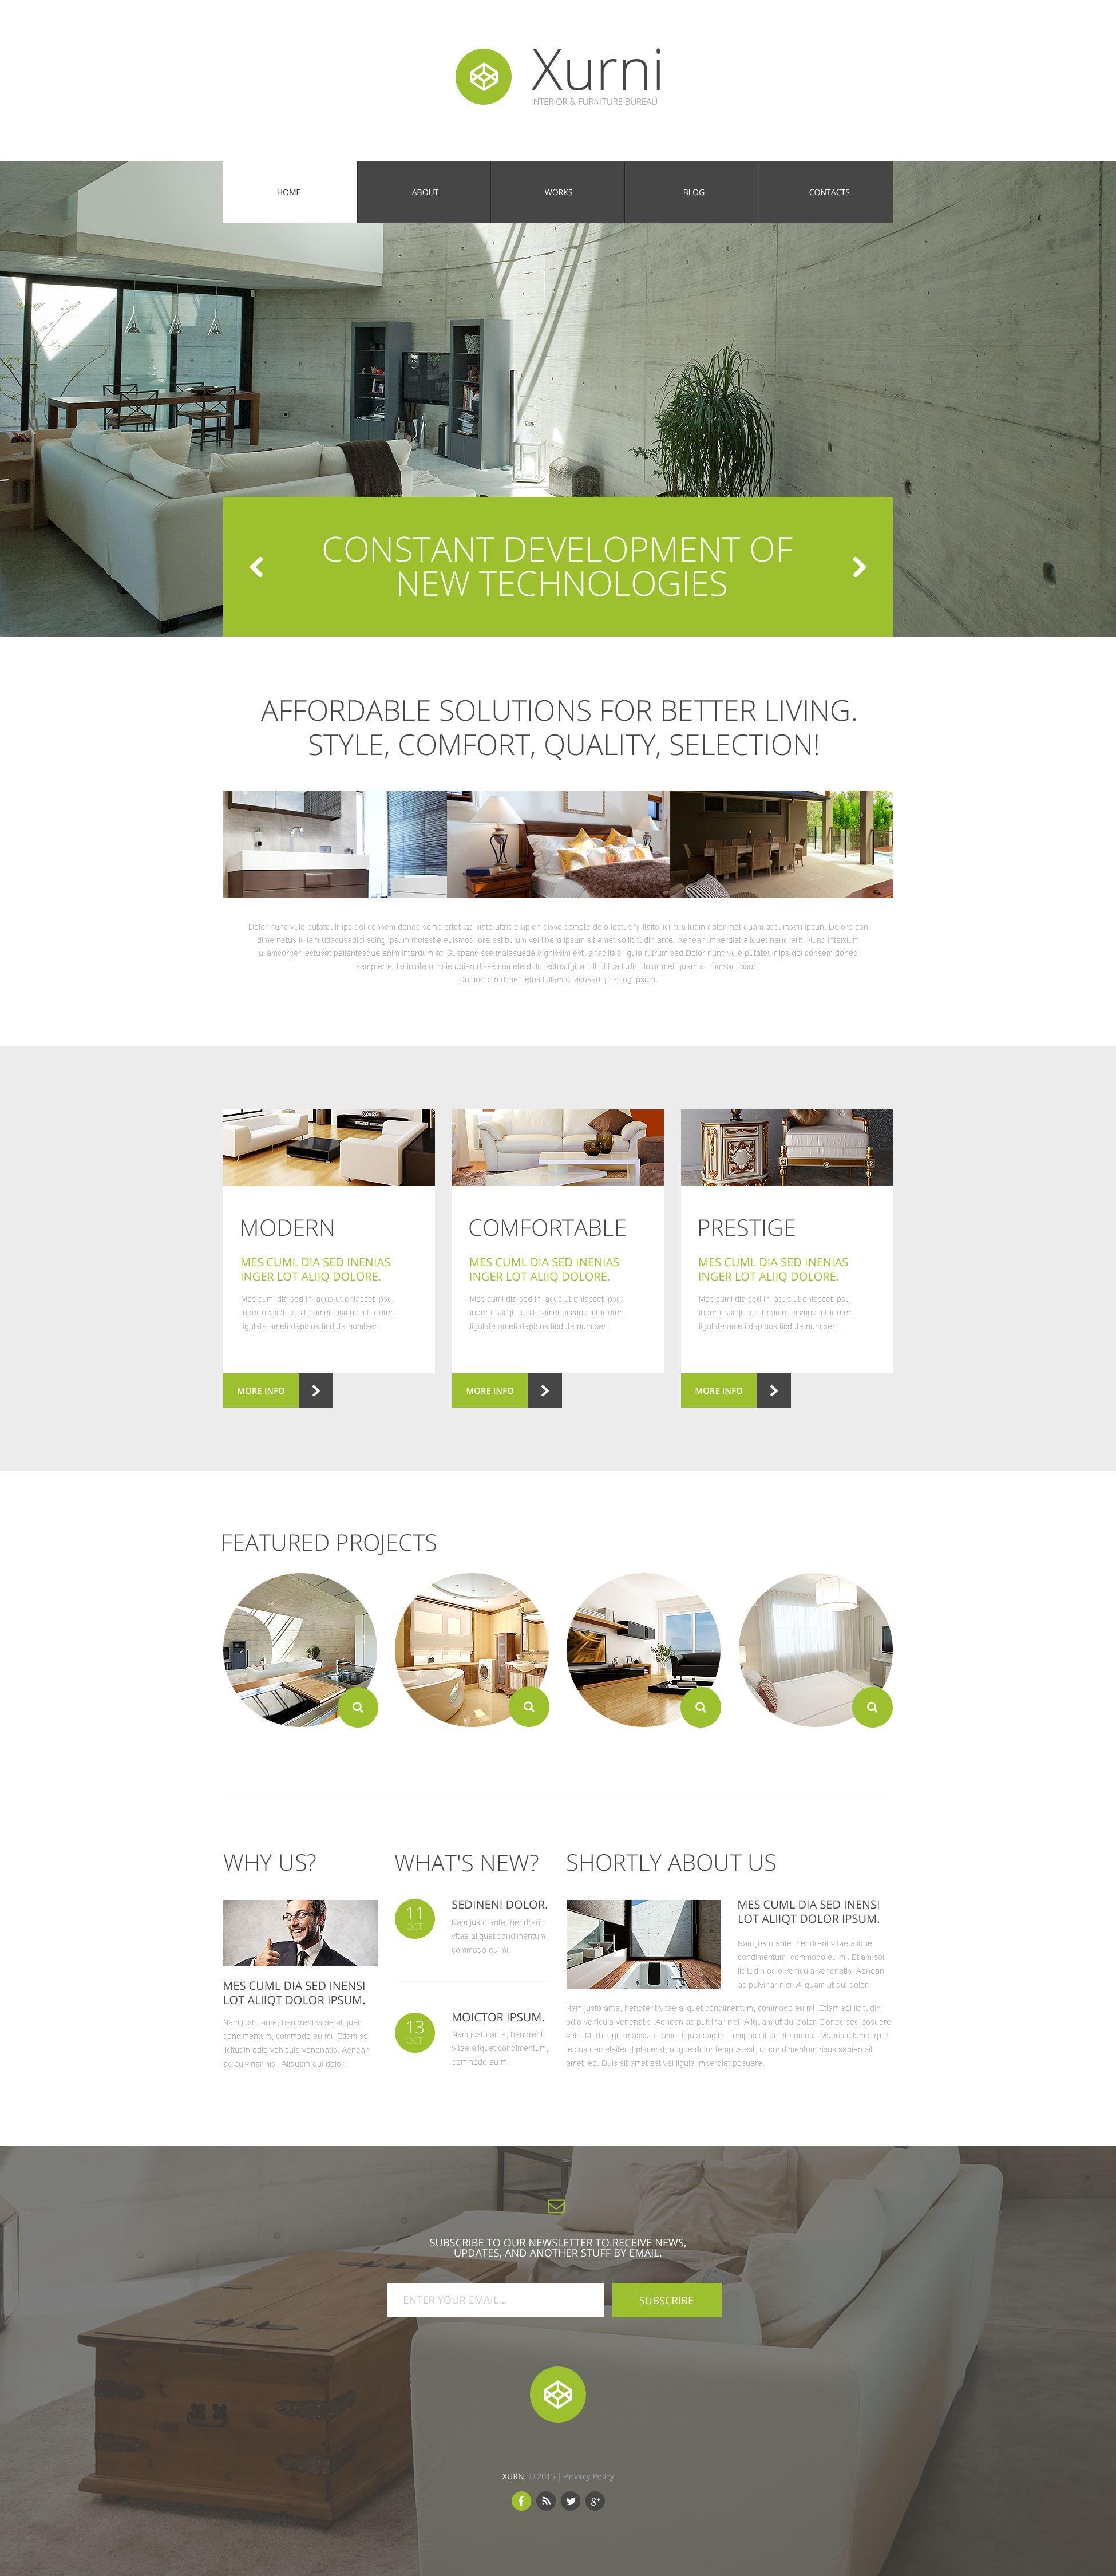 """Interior  Furniture Store"" - адаптивний WordPress шаблон №53391 - скріншот"